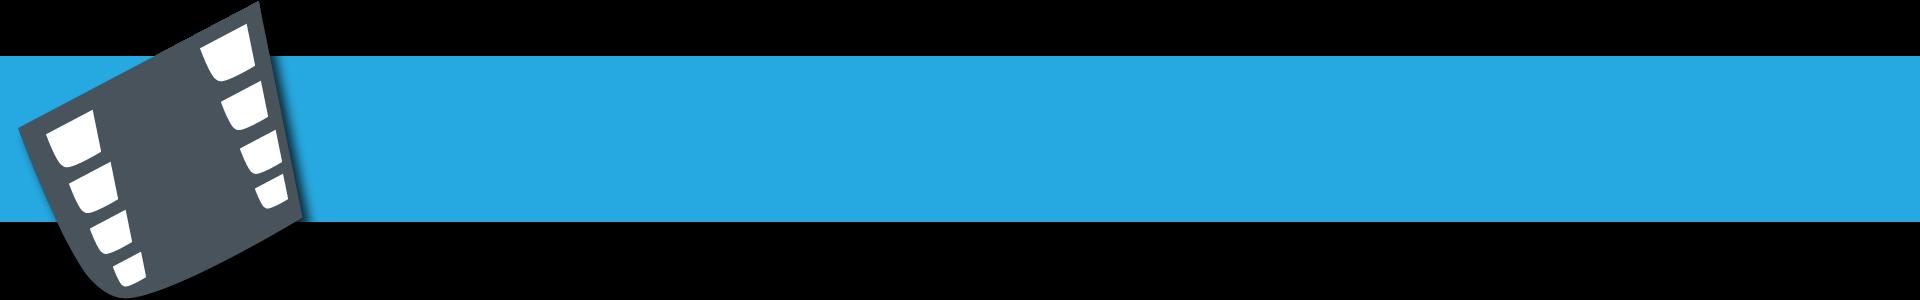 VWF-Screening-Banner.png